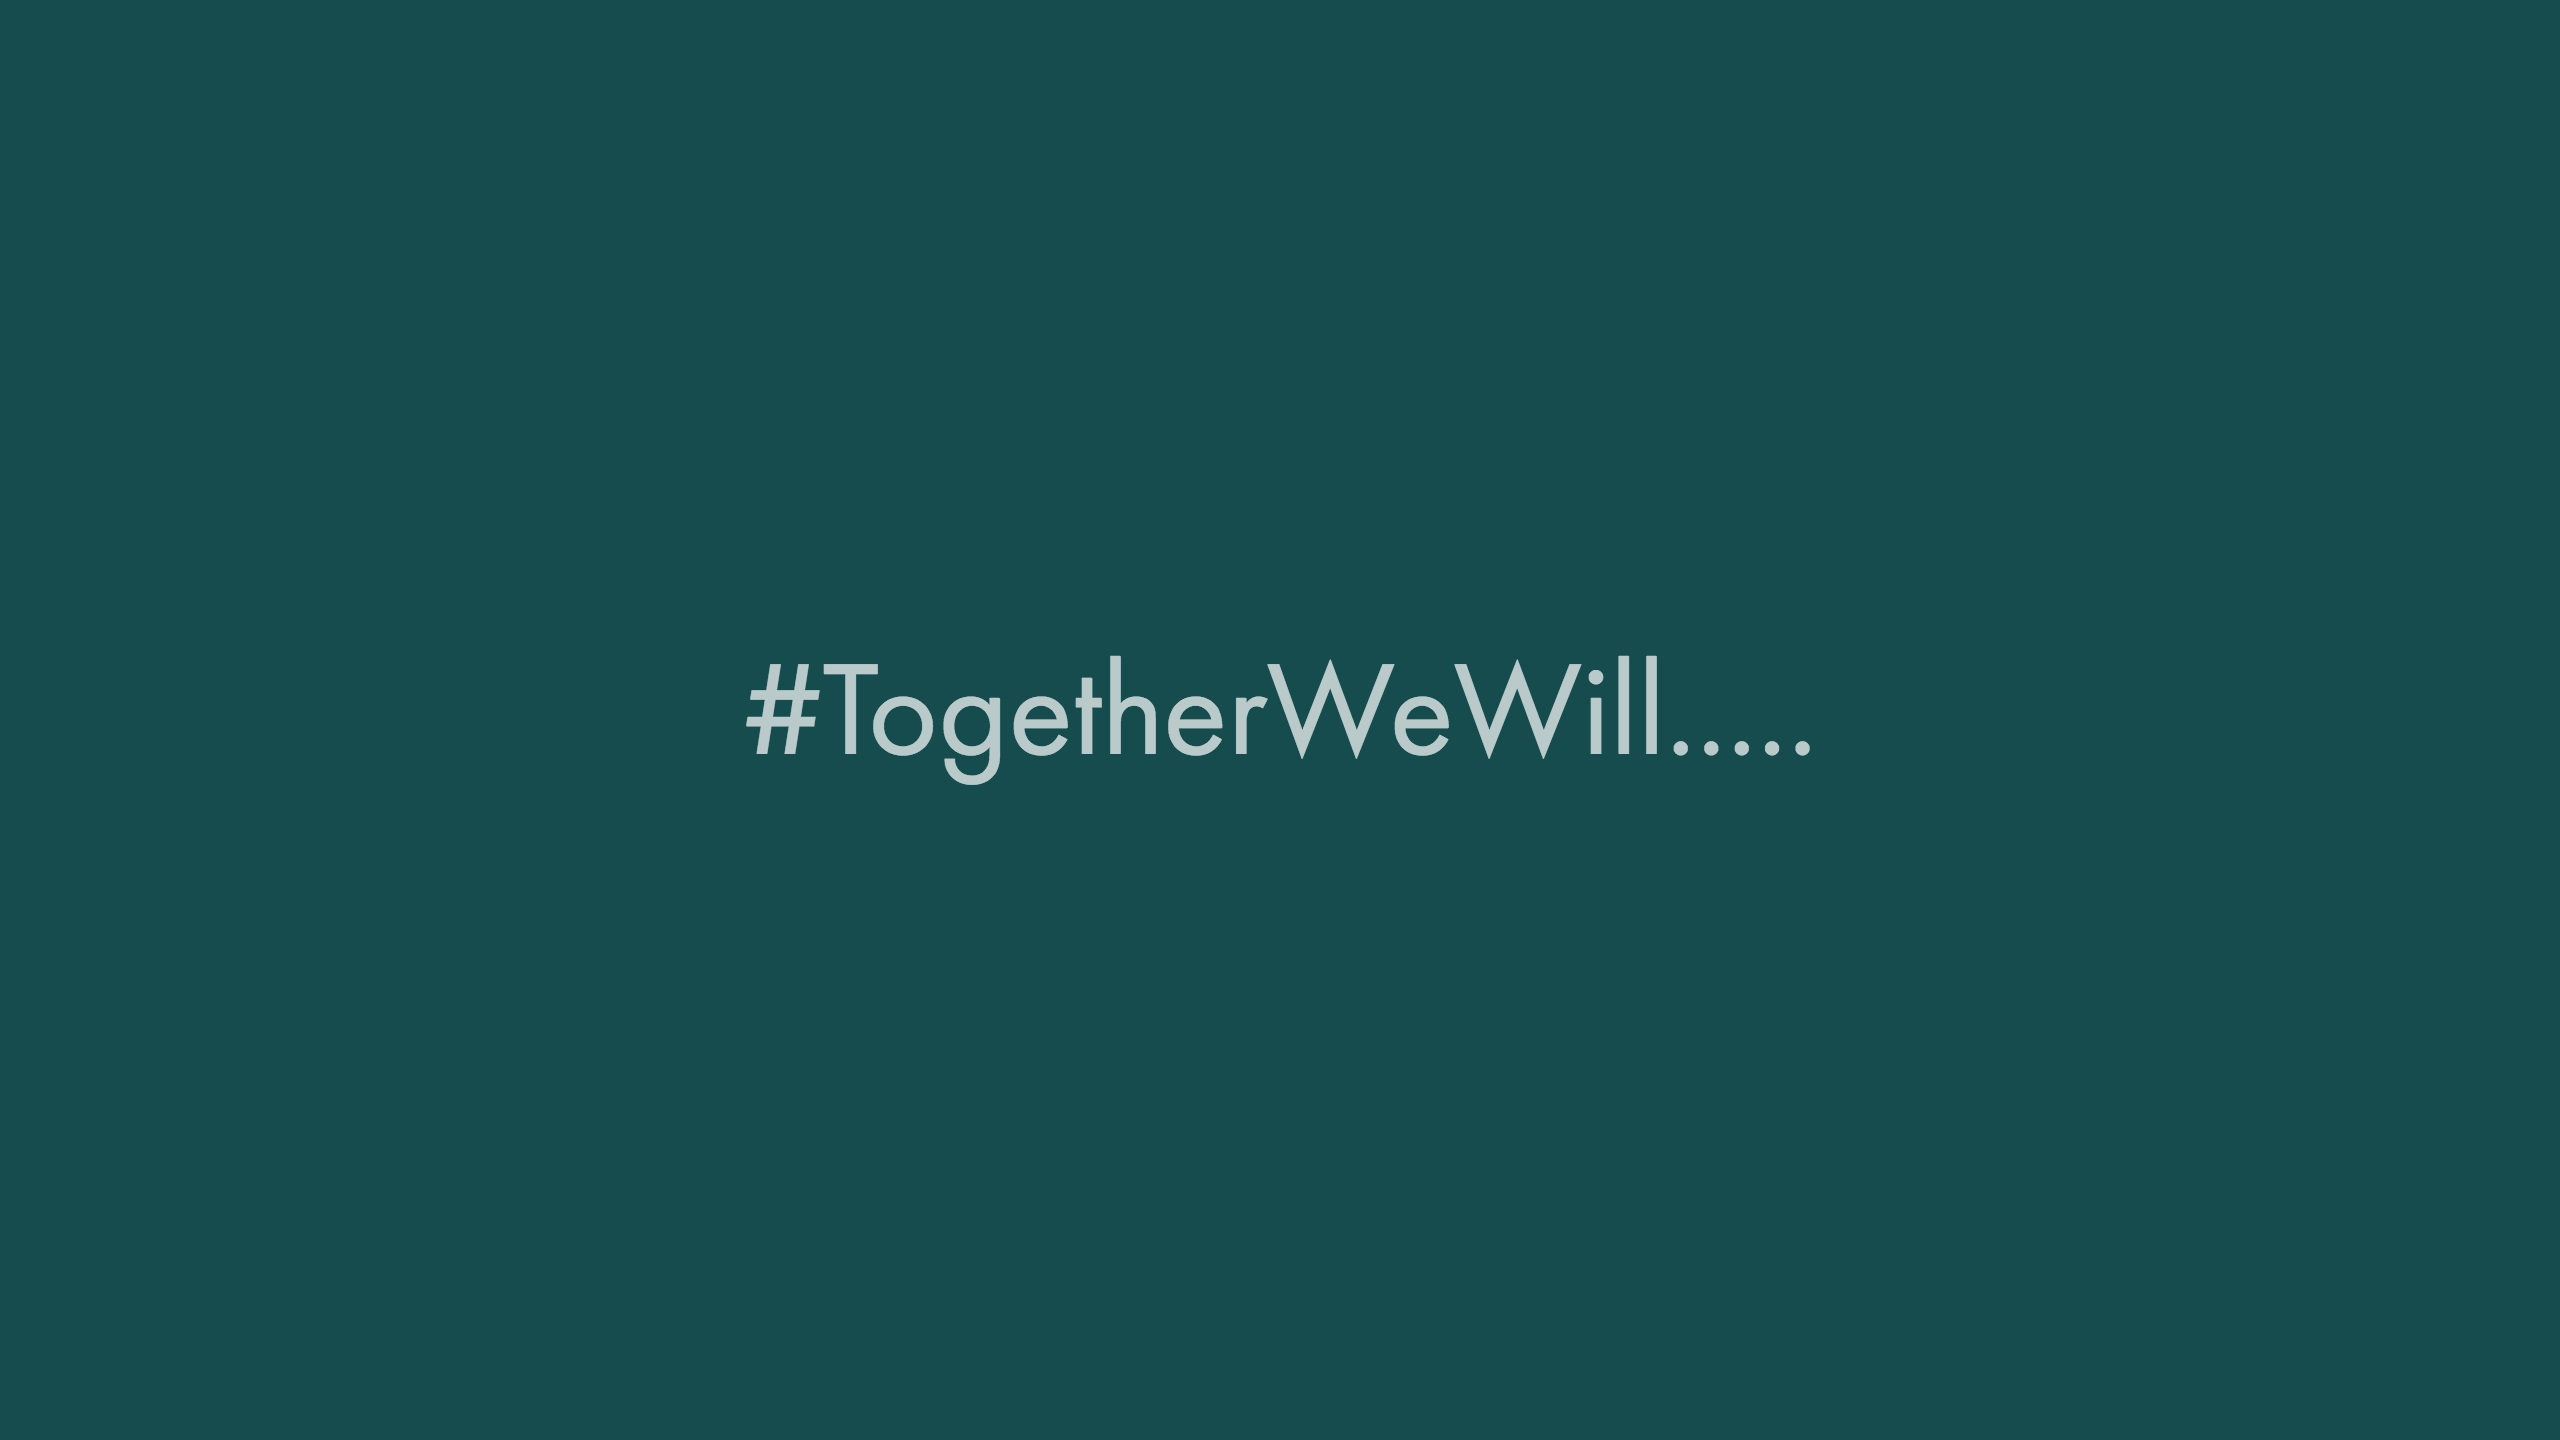 #togetherwewill